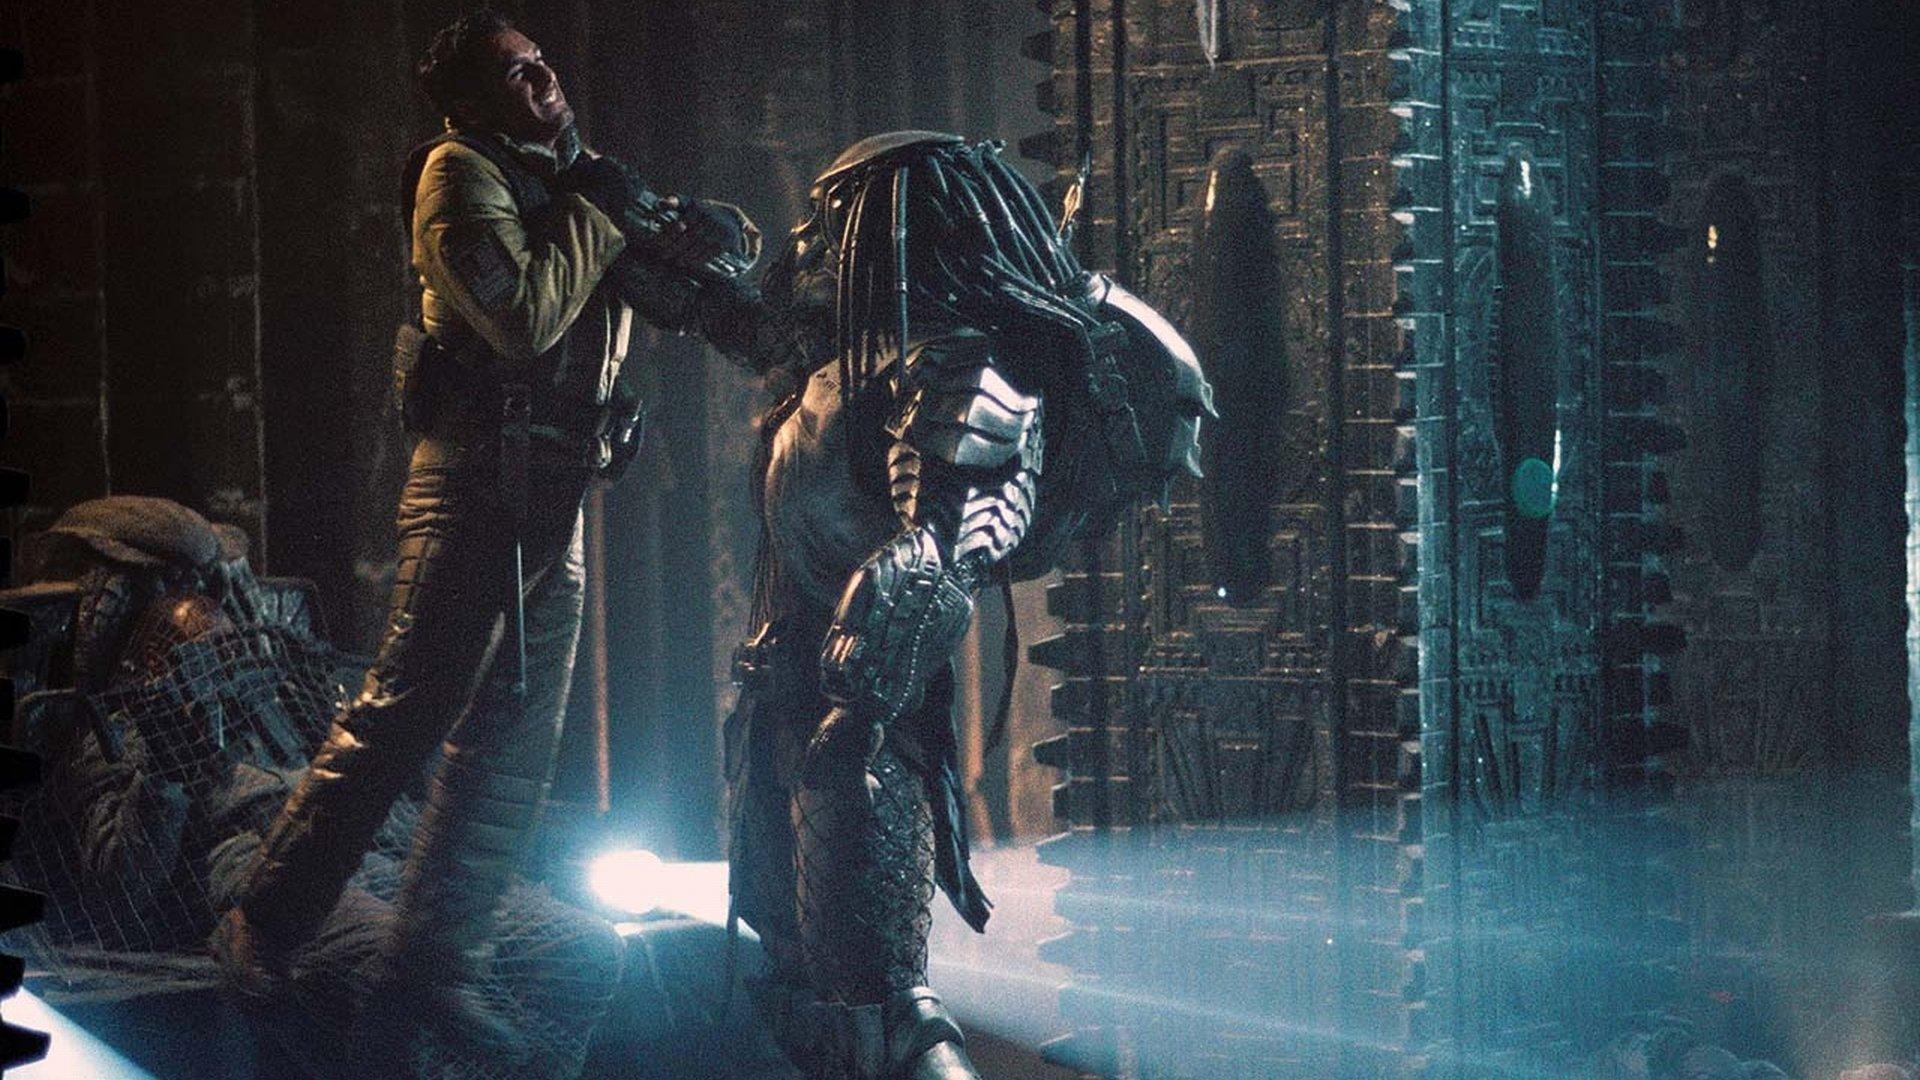 10 Avp Alien Vs Predator Hd Wallpapers Background Images